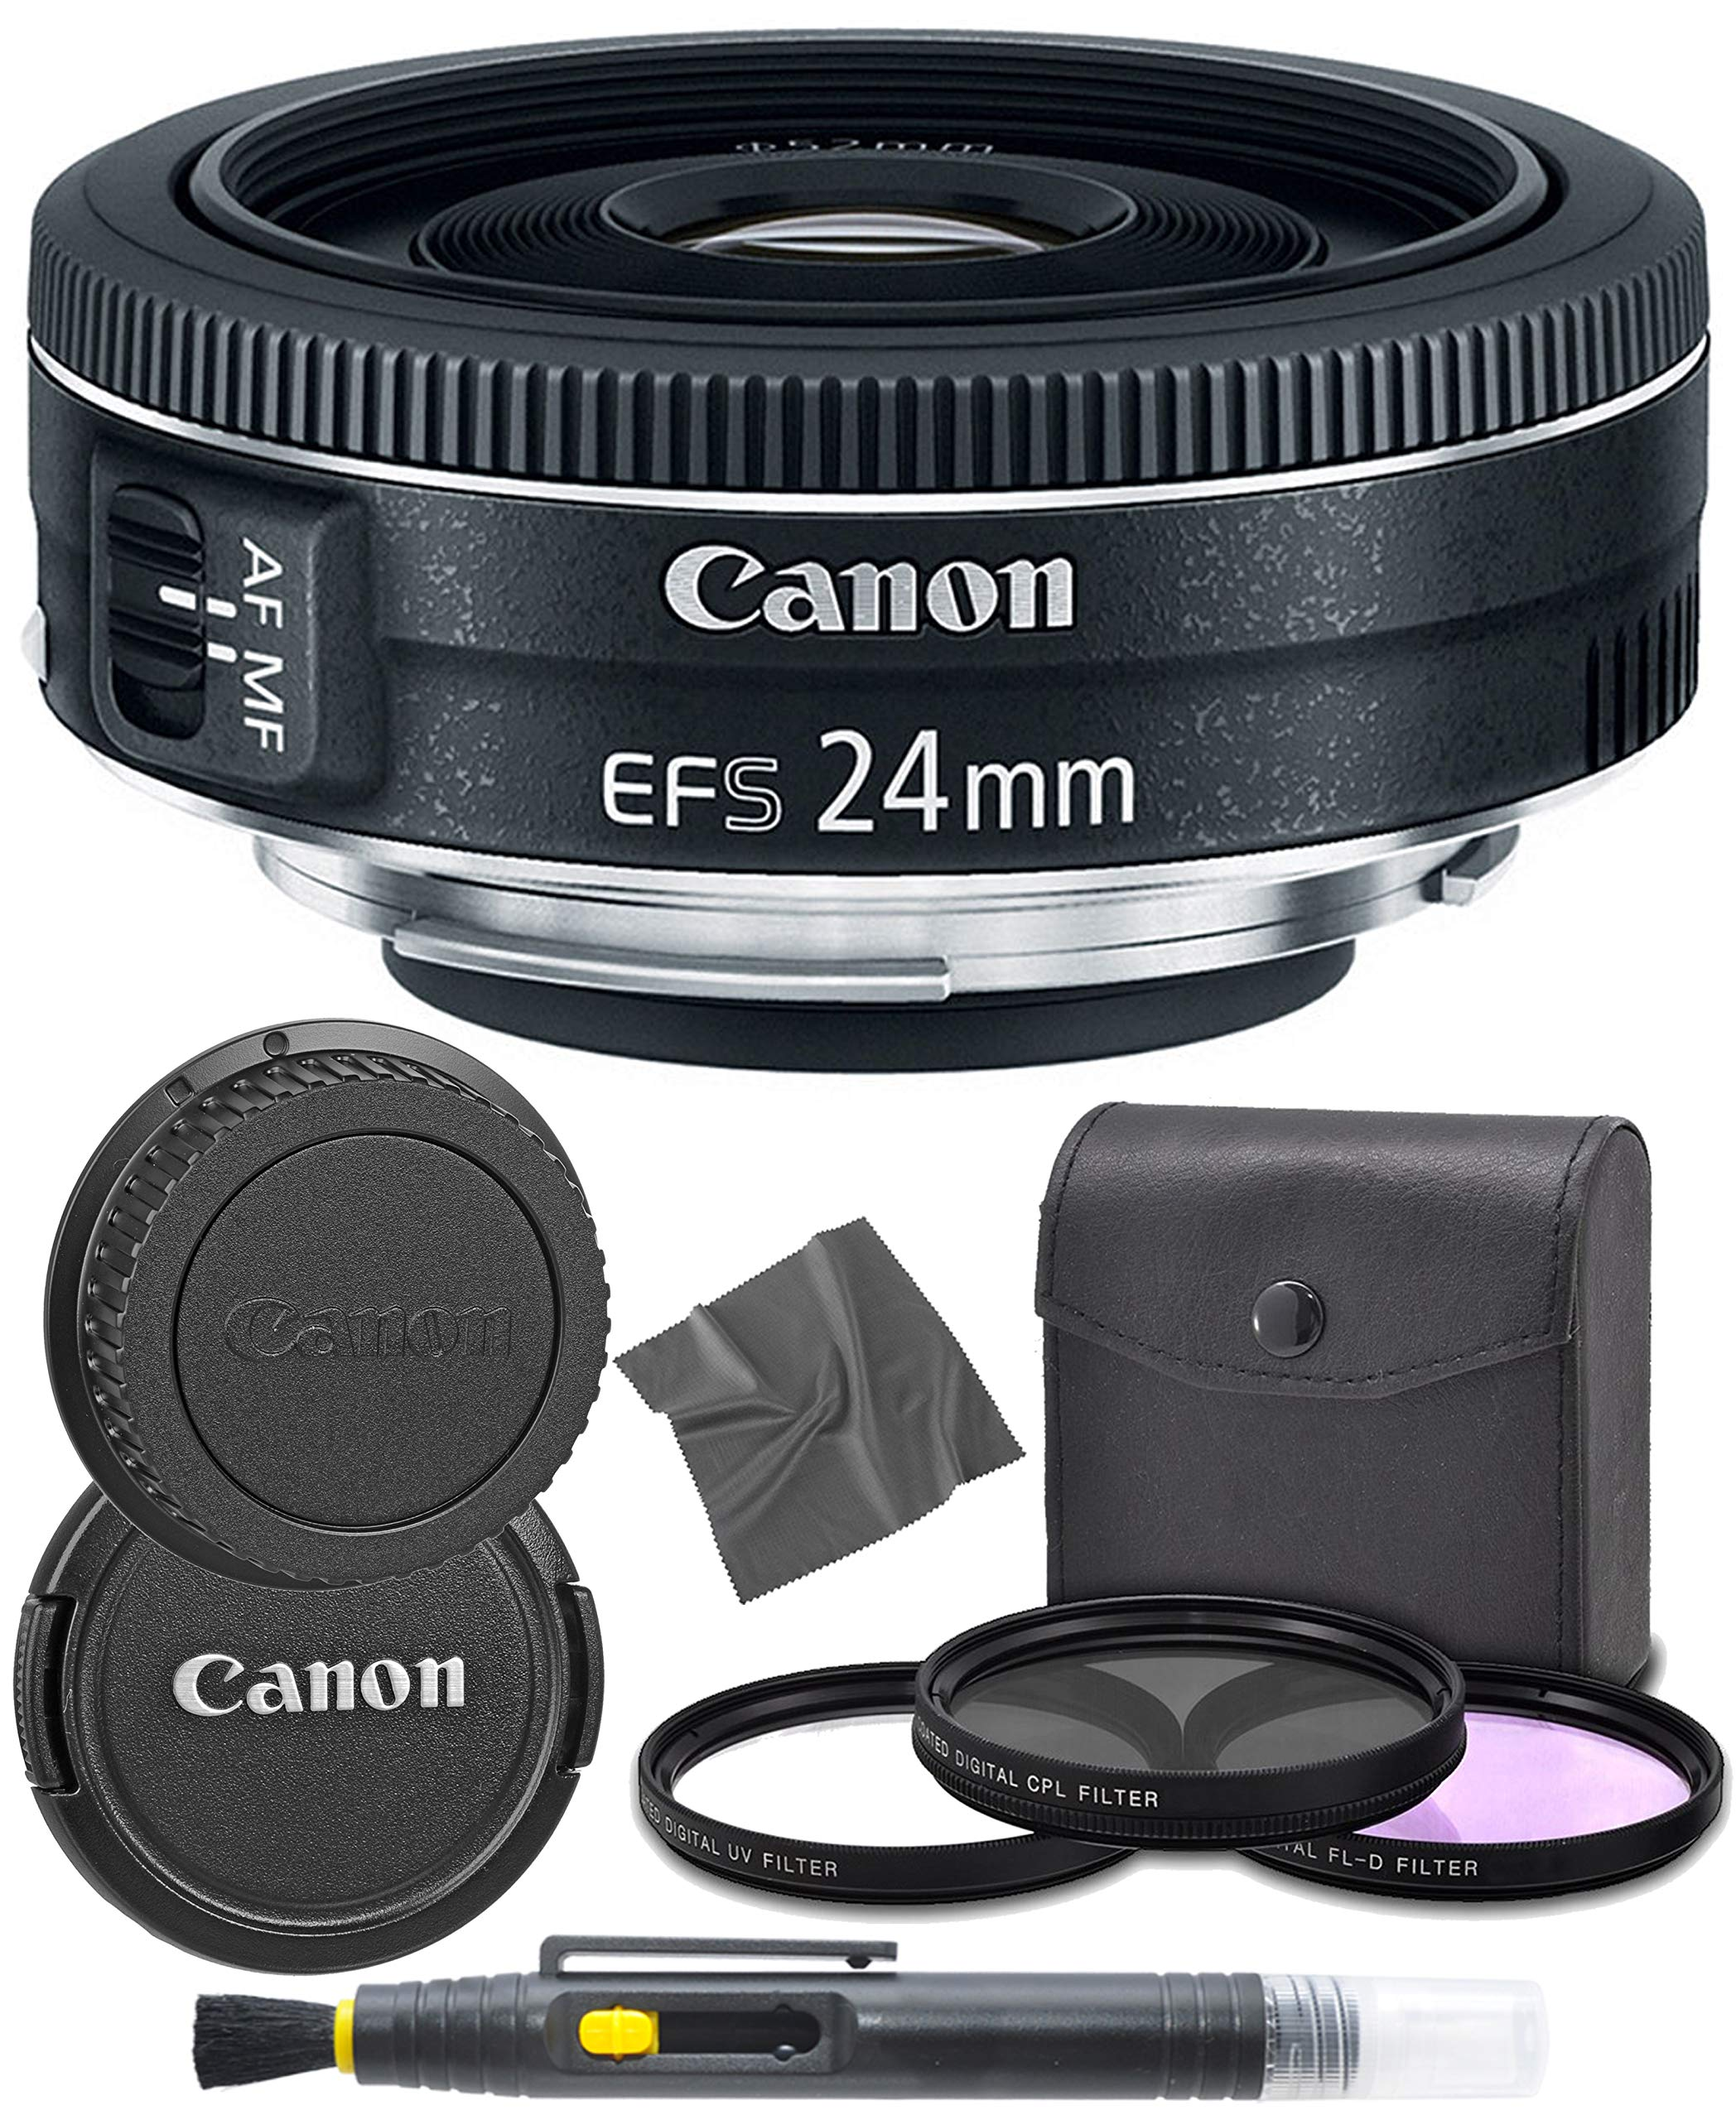 CanonEF-S 24mm f/2.8 STM: (9522B002) Lens + AOM Pro Starter Kit Bundle - International Version (1 Year AOM Warranty) by AOM